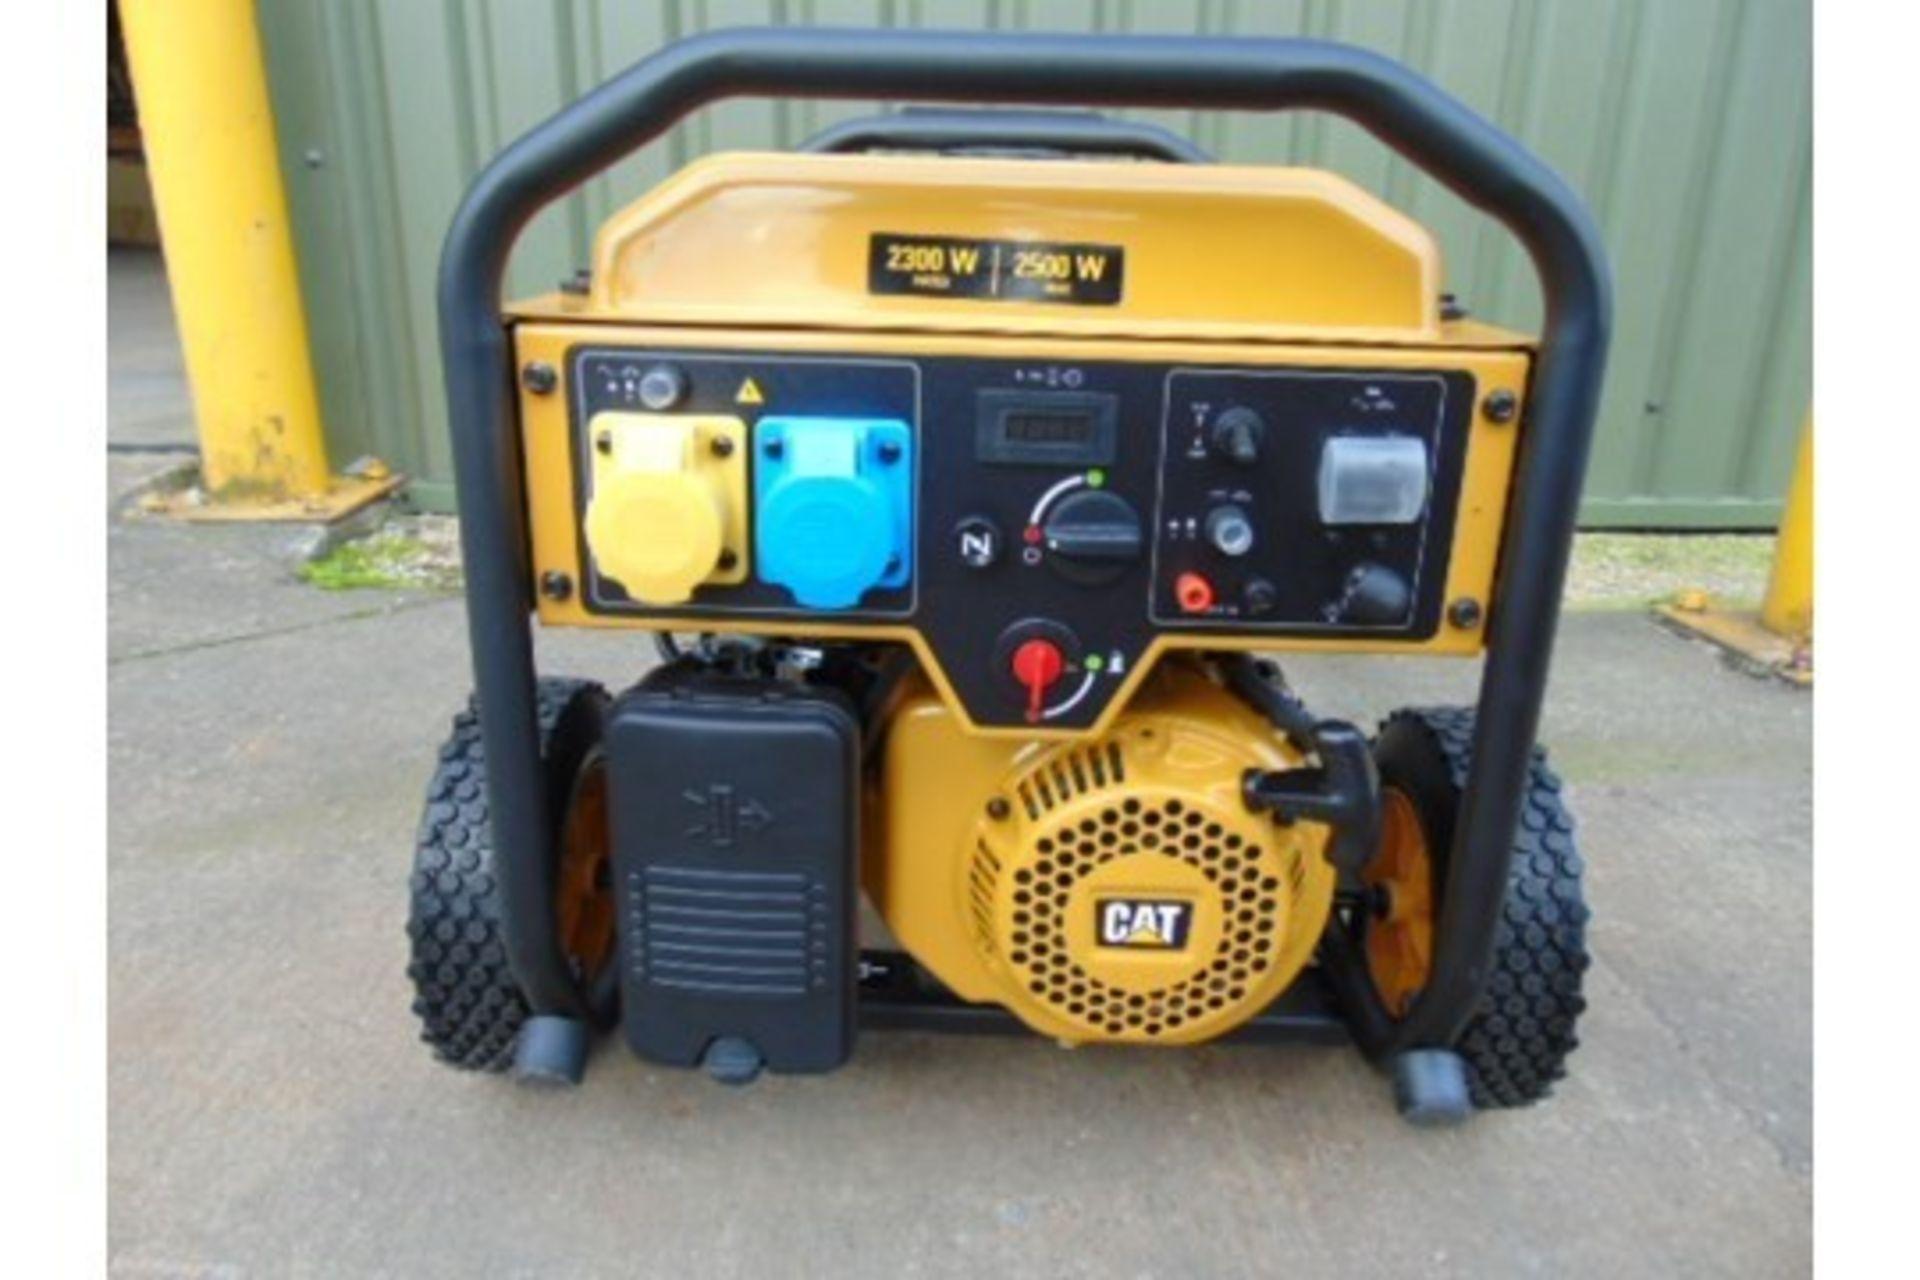 Lot 26594 - UNISSUED Caterpillar RP2500 Industrial Petrol Generator Set.